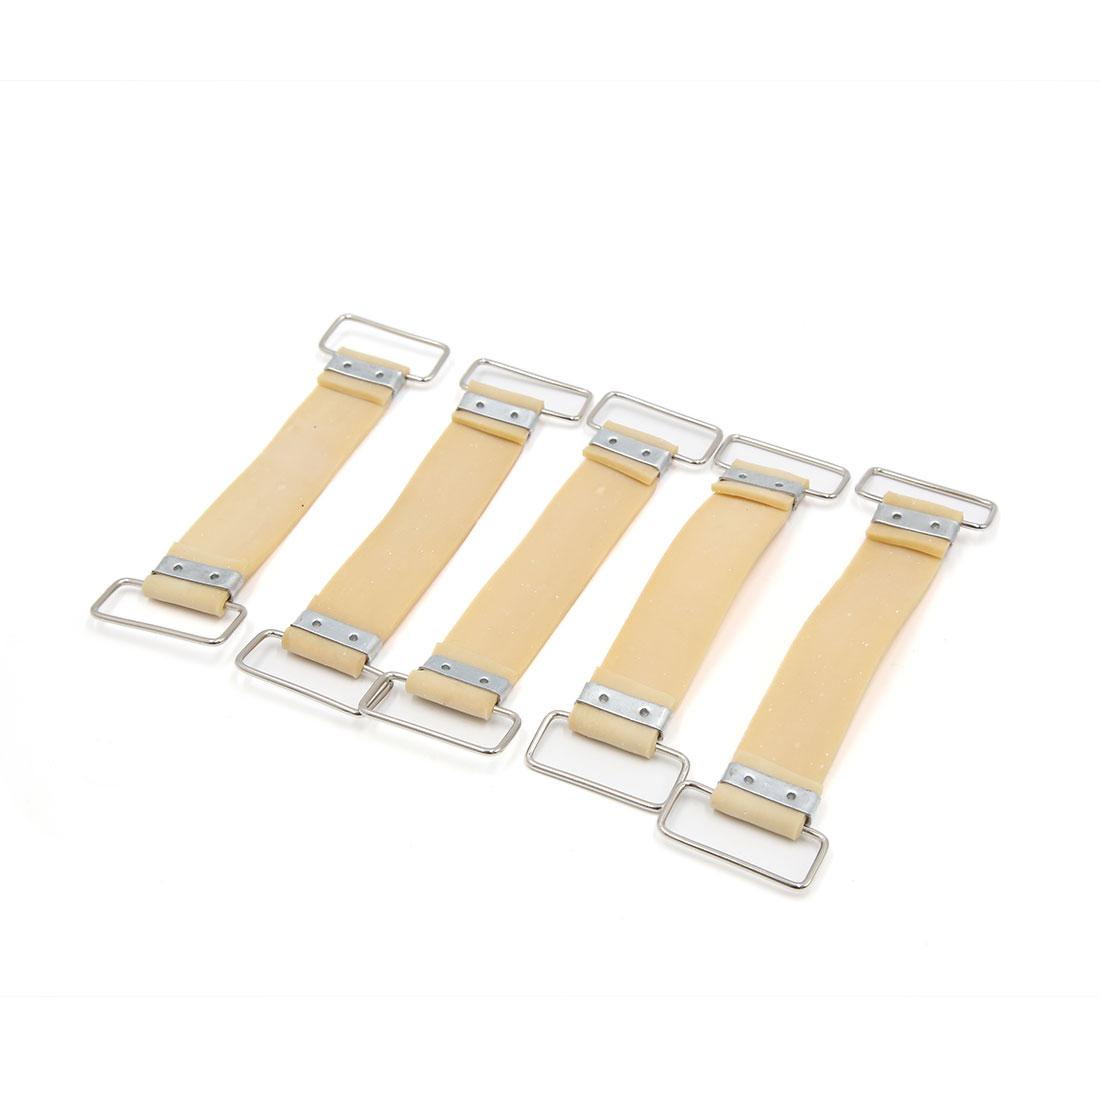 5 Pcs Khaki Bettery Fixed Holder Rubber Strap Band Bandge for Motorcycle